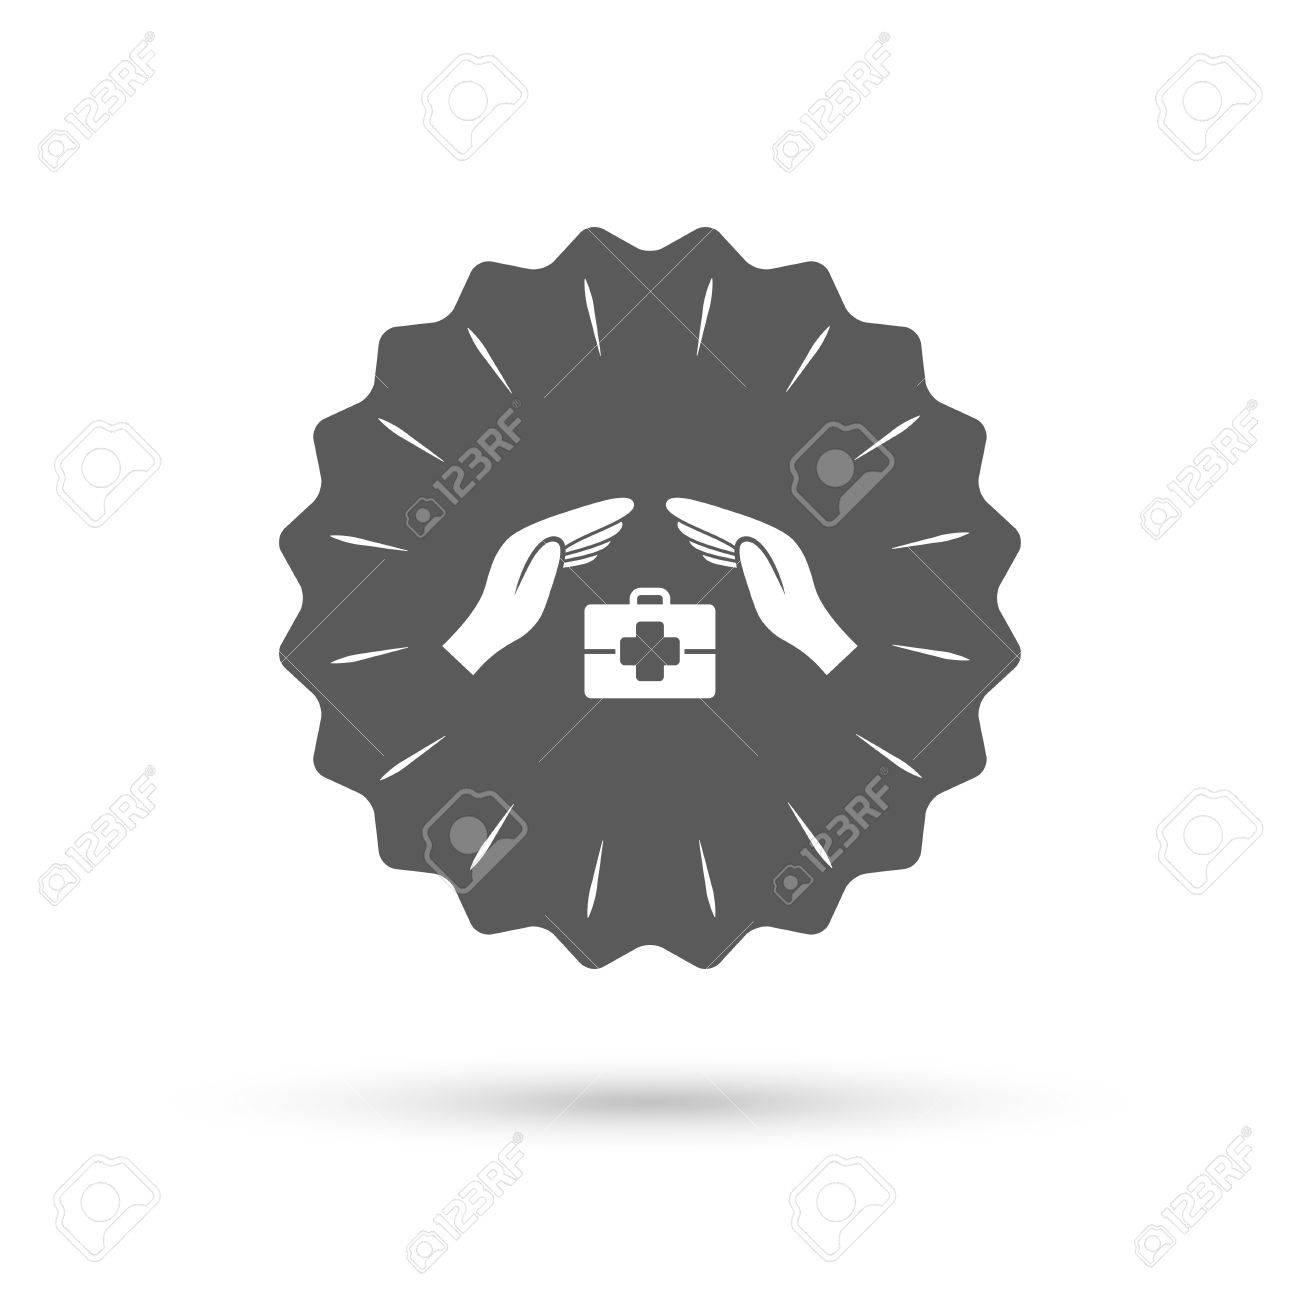 showing post media for vintage health symbol symbolsnet com vintage health symbol vintage emblem medal medical insurance sign icon health insurance symbol